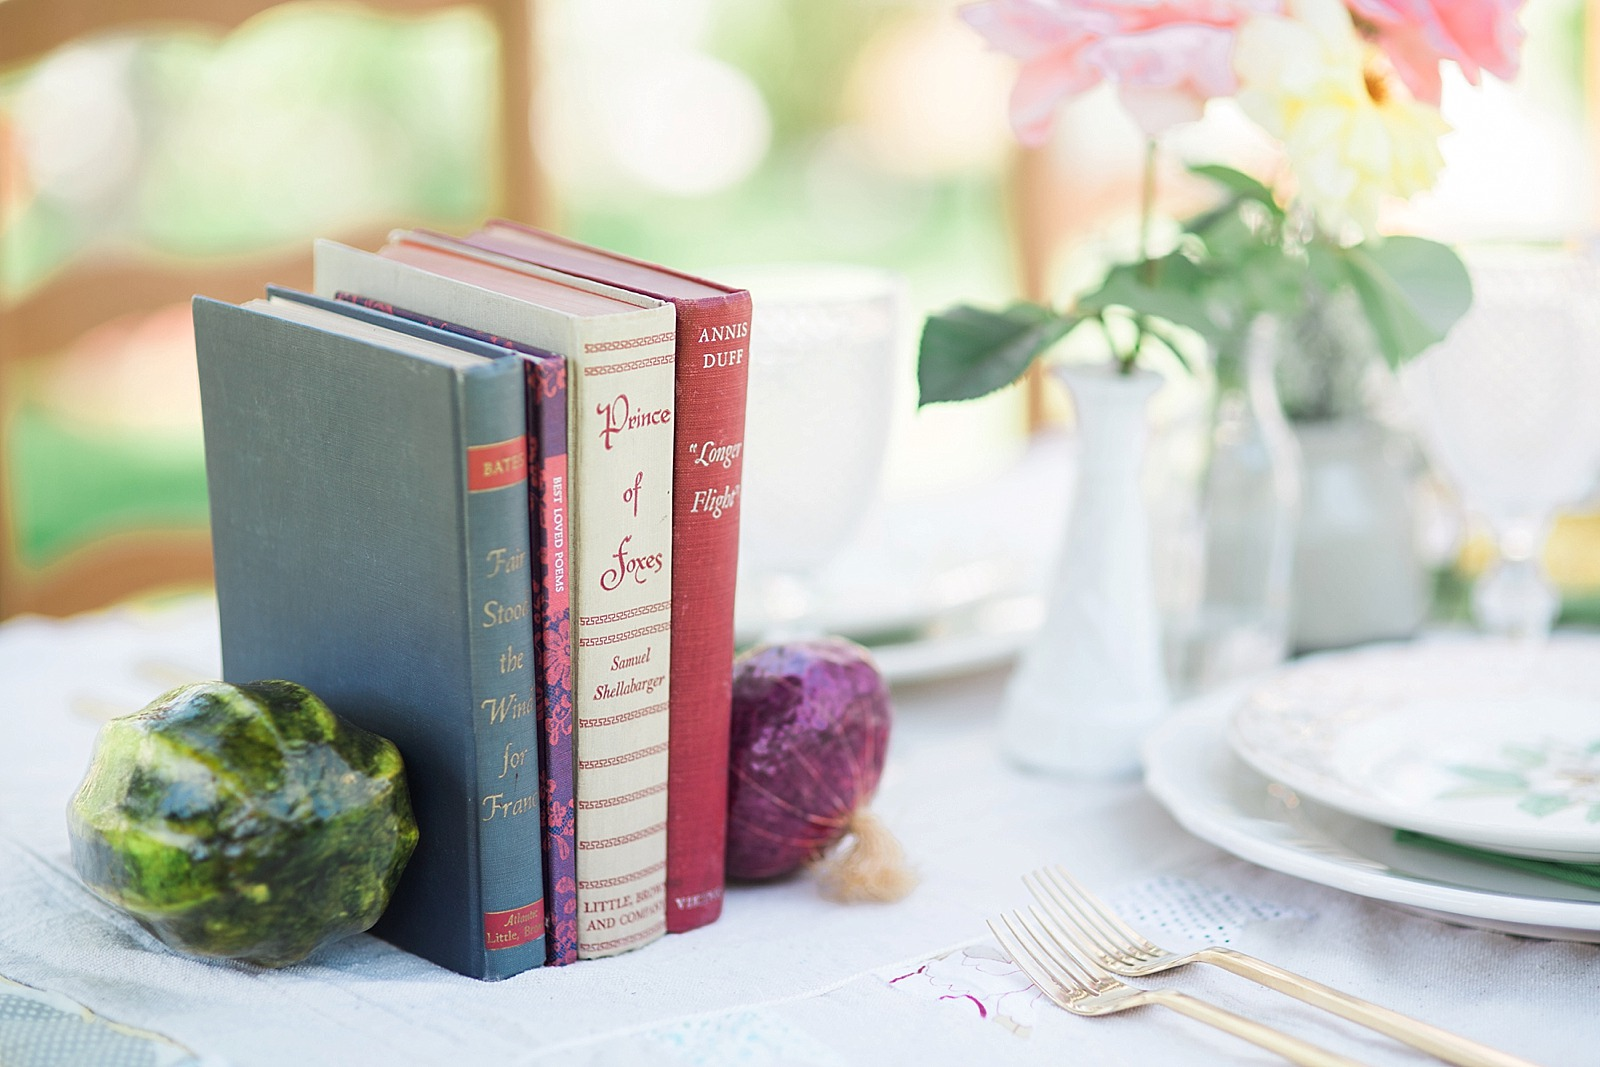 diana-elizabeth-blog-lifestyle-dunkin-creamers-dunkin-donuts-brunch-book-club--4522